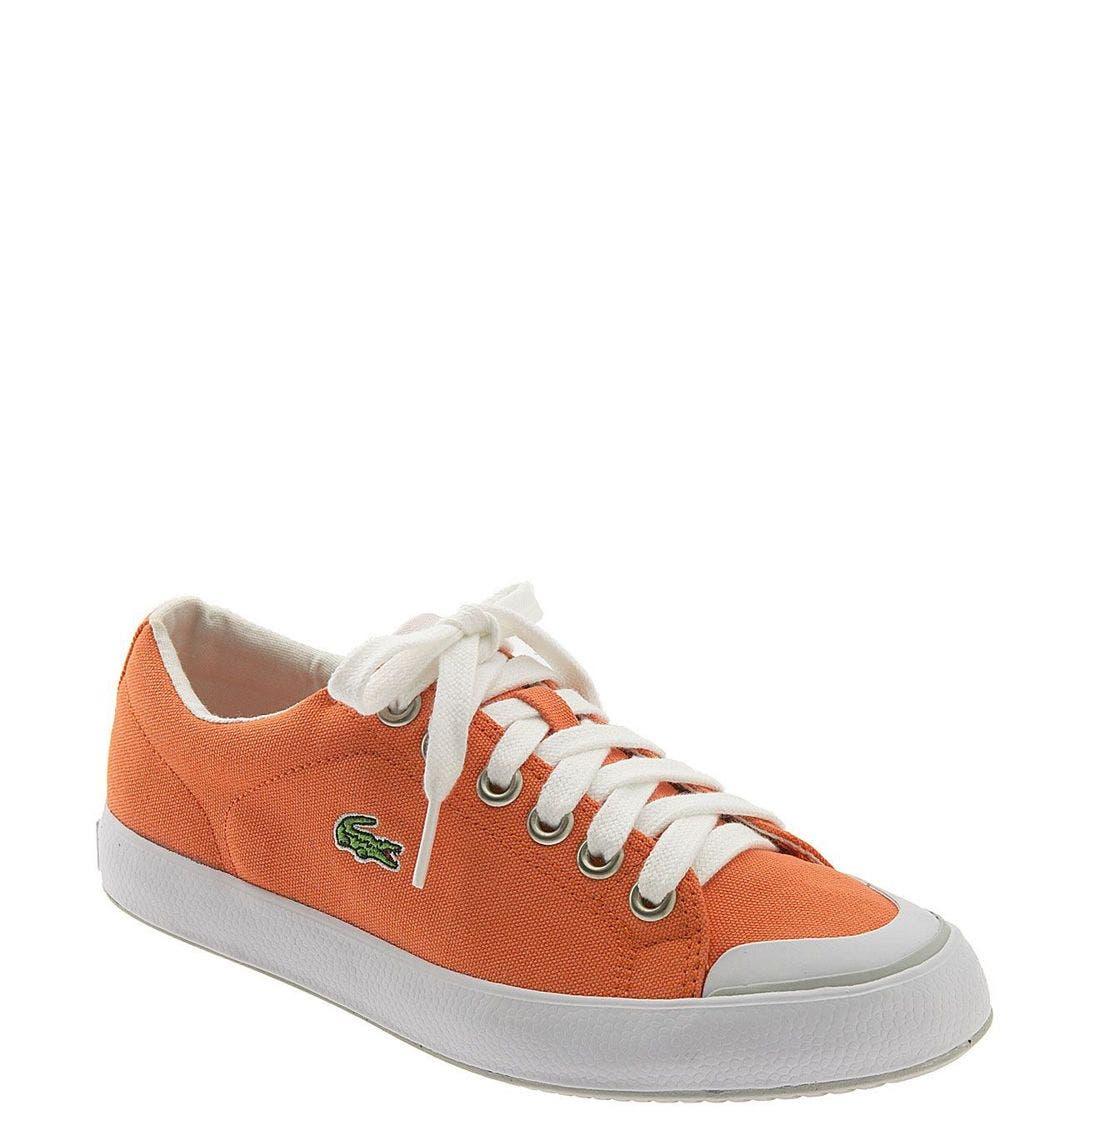 Main Image - Lacoste 'L33 Canvas' Sneaker (Women)